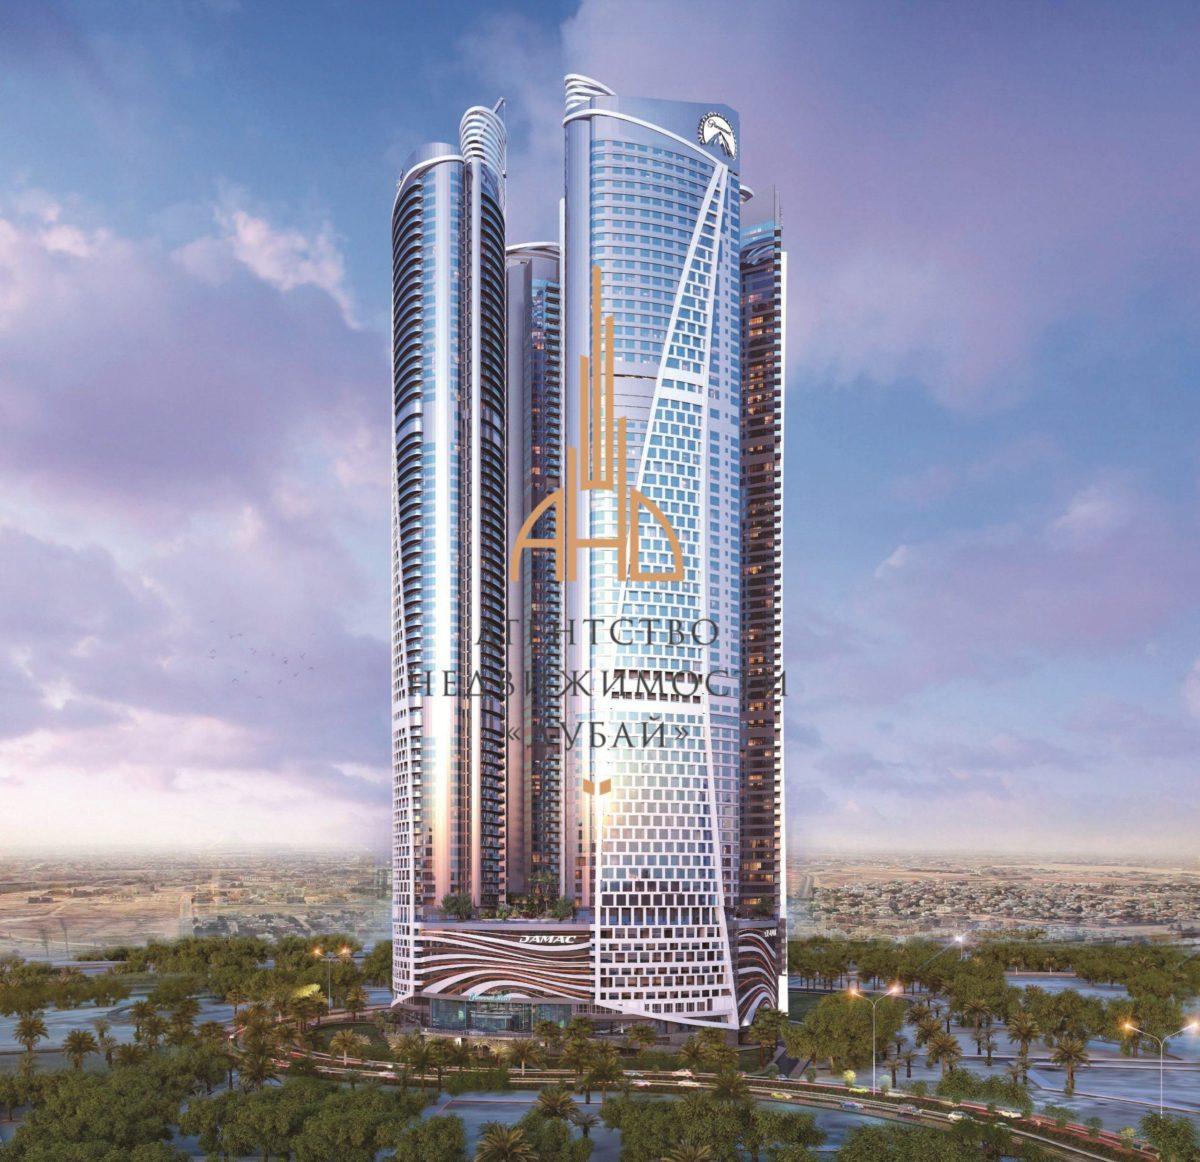 2x комнатная квартира |Damac Towers by Paramount Hotels & Resorts|ОАЭ, Дубай.